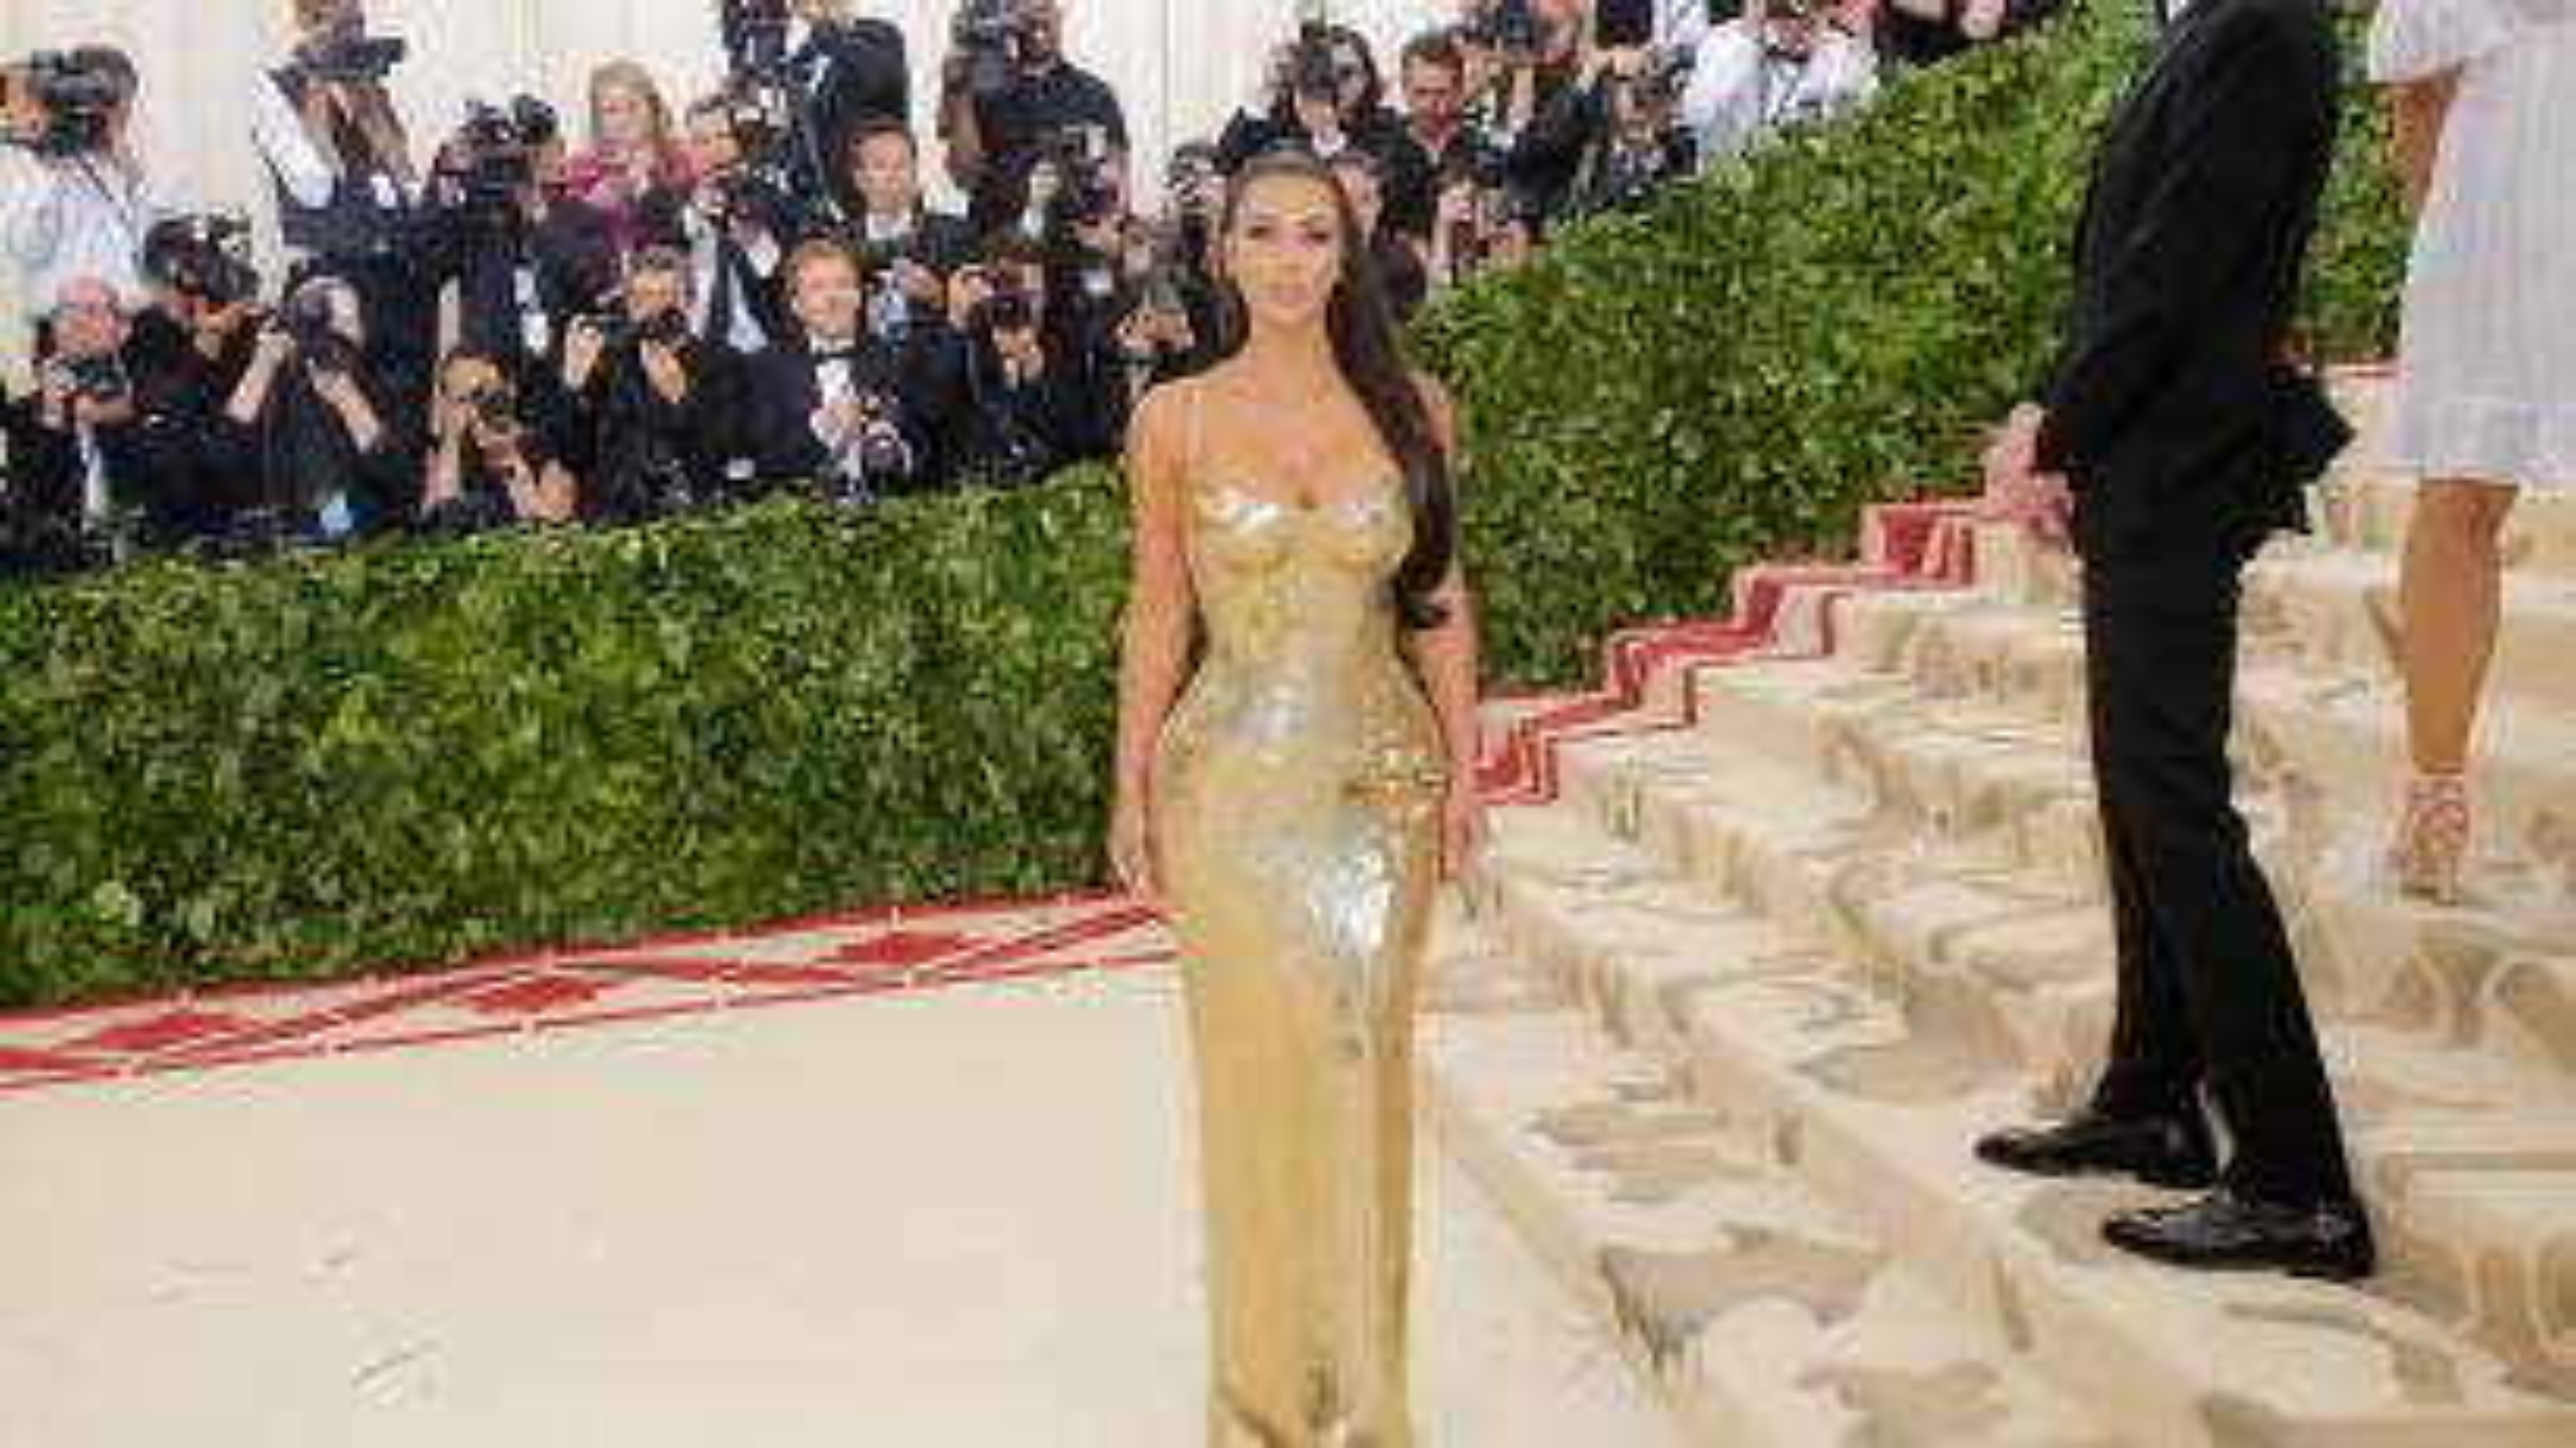 Kim Kardashian will meet Donald Trump at the White House